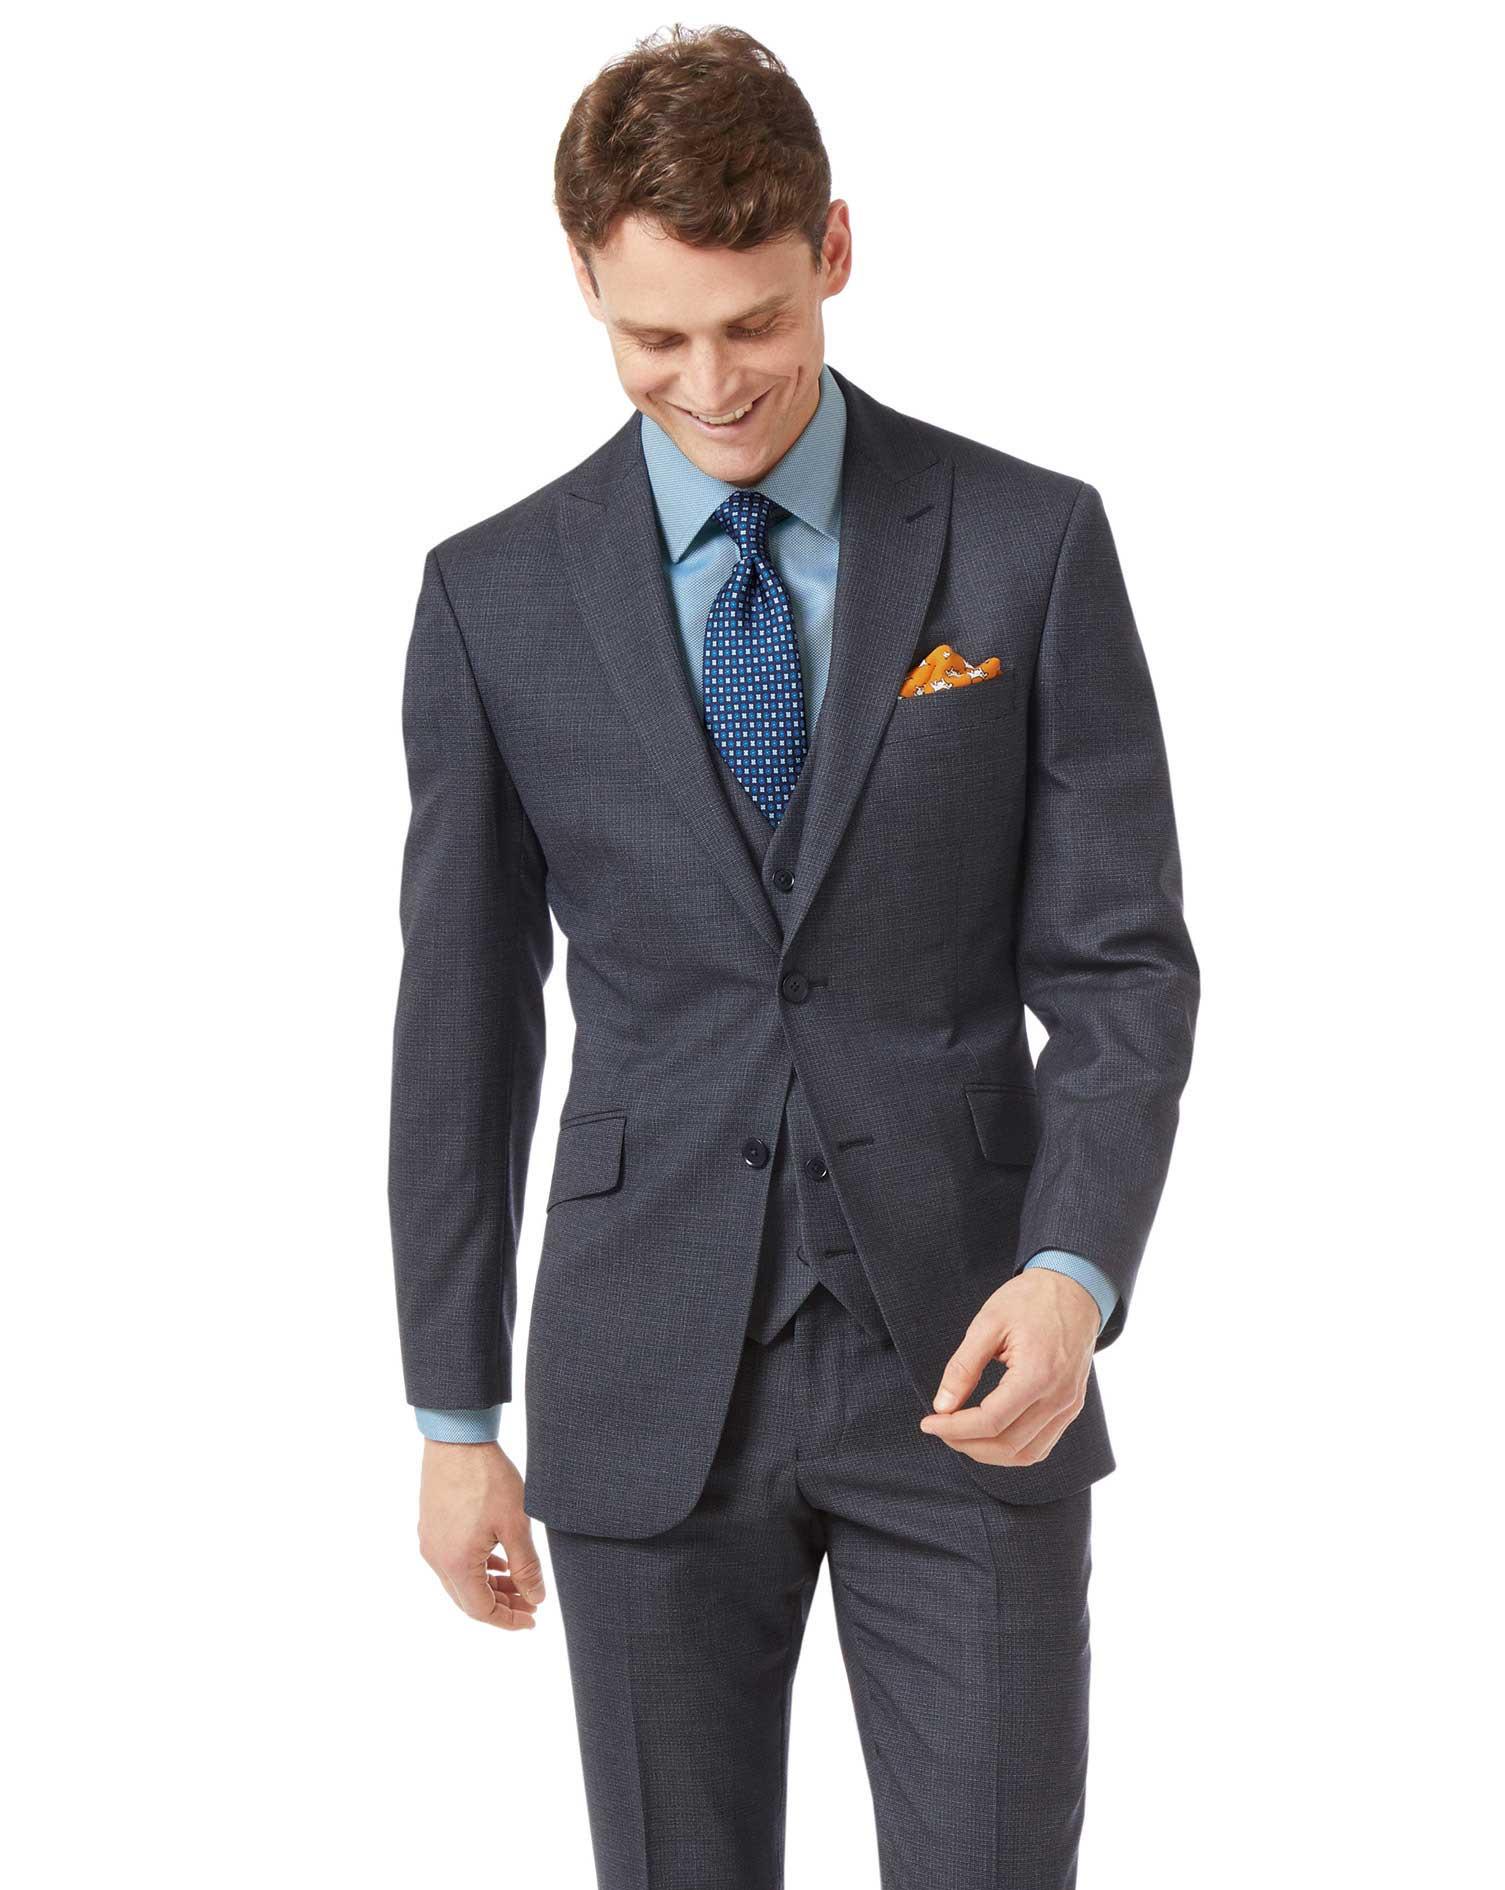 Airforce Blue Slim Jaspe Business Suit Wool Jacket Size 36 Short by Charles Tyrwhitt